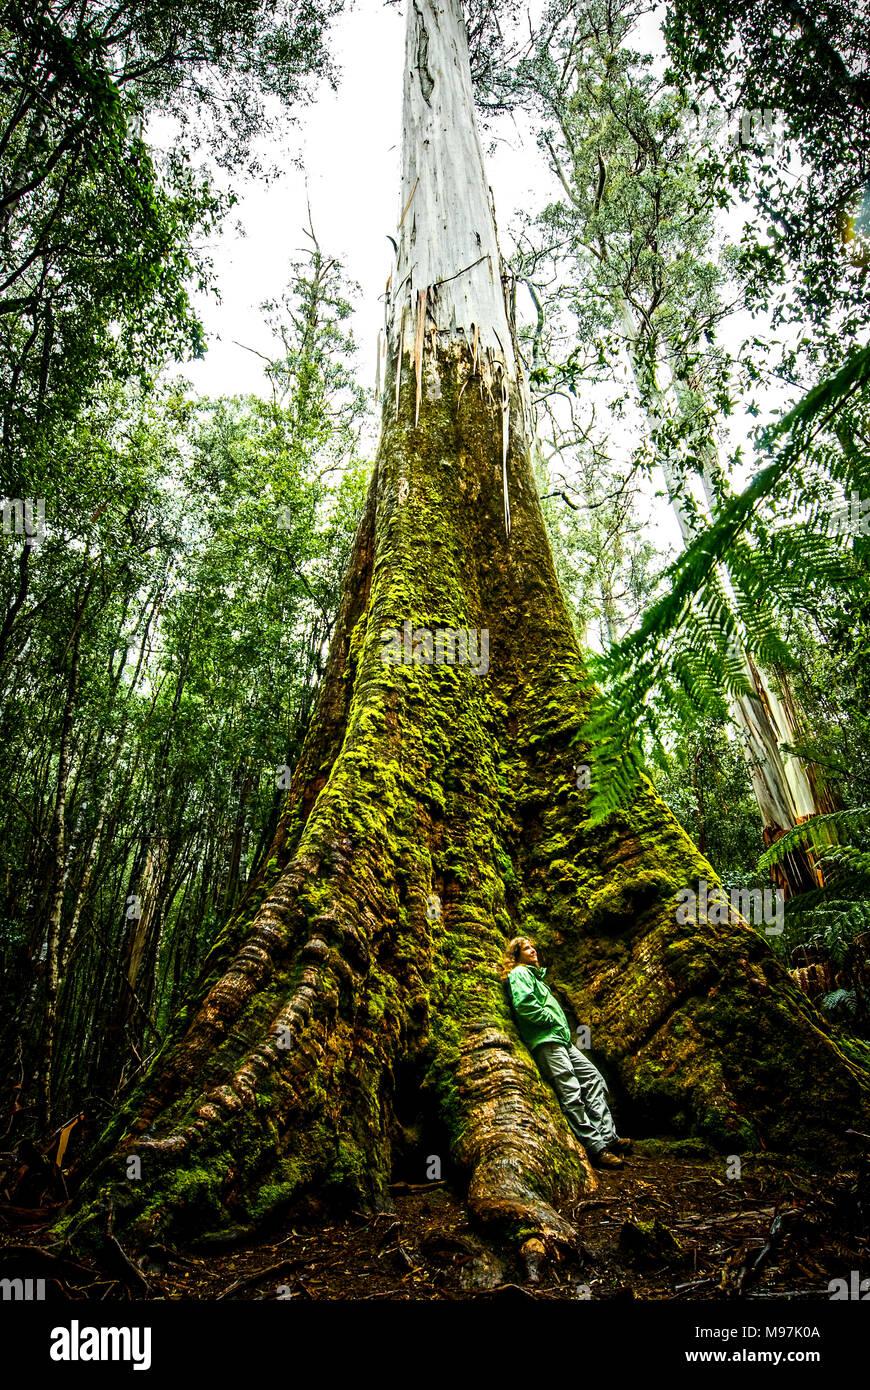 Australien, Tasmanien, Bäume, Baumriesen, Laubbäume, Eucalyptus, Swamp Gums, Mount Field National Park - Stock Image